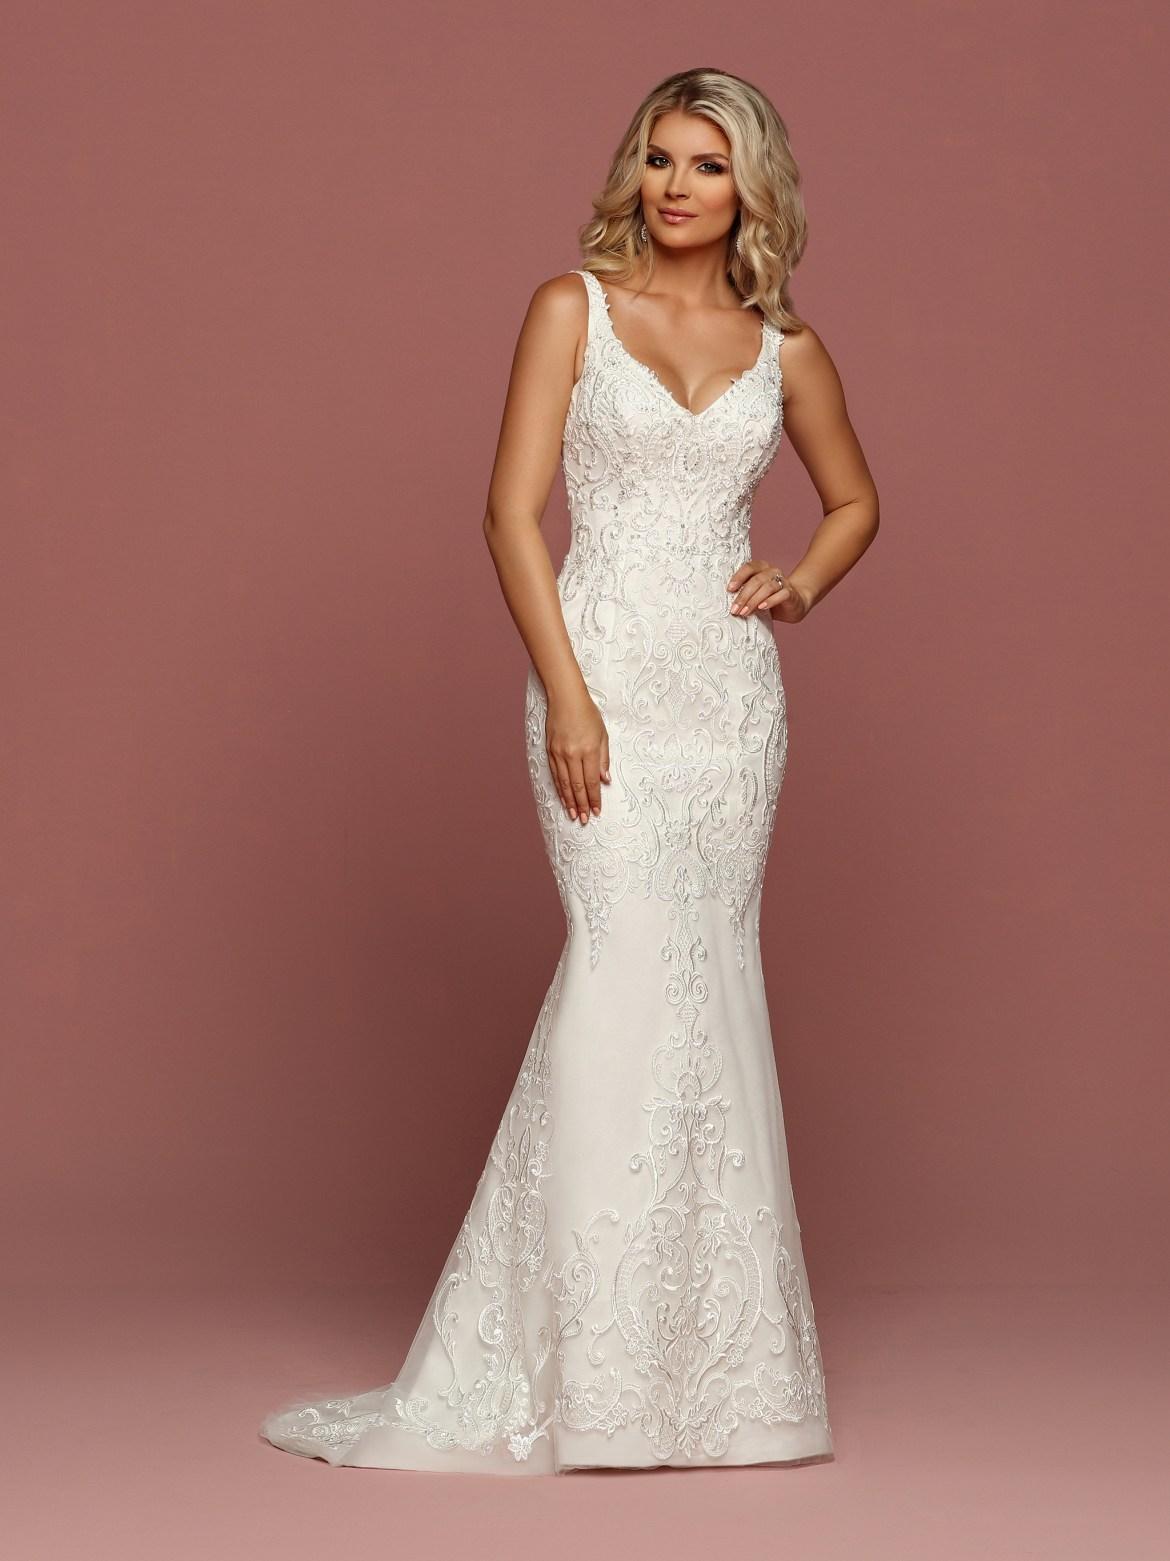 Sheath Form Fitting Lace Wedding Dresses Davinci Bridal Blog